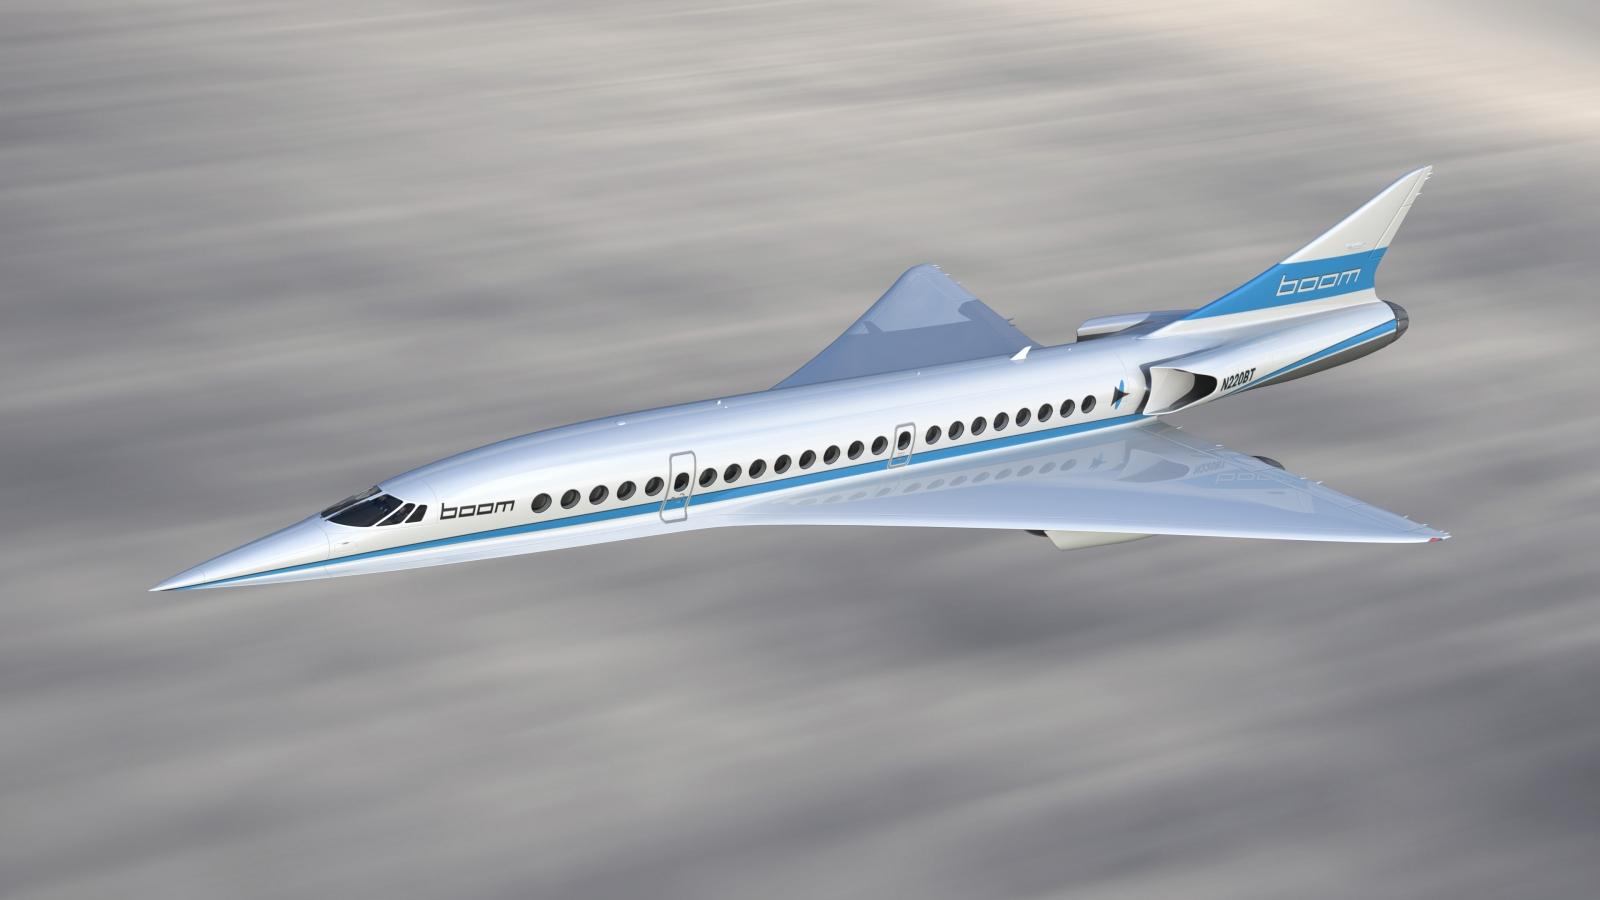 Boom XB-1 supersonic jet